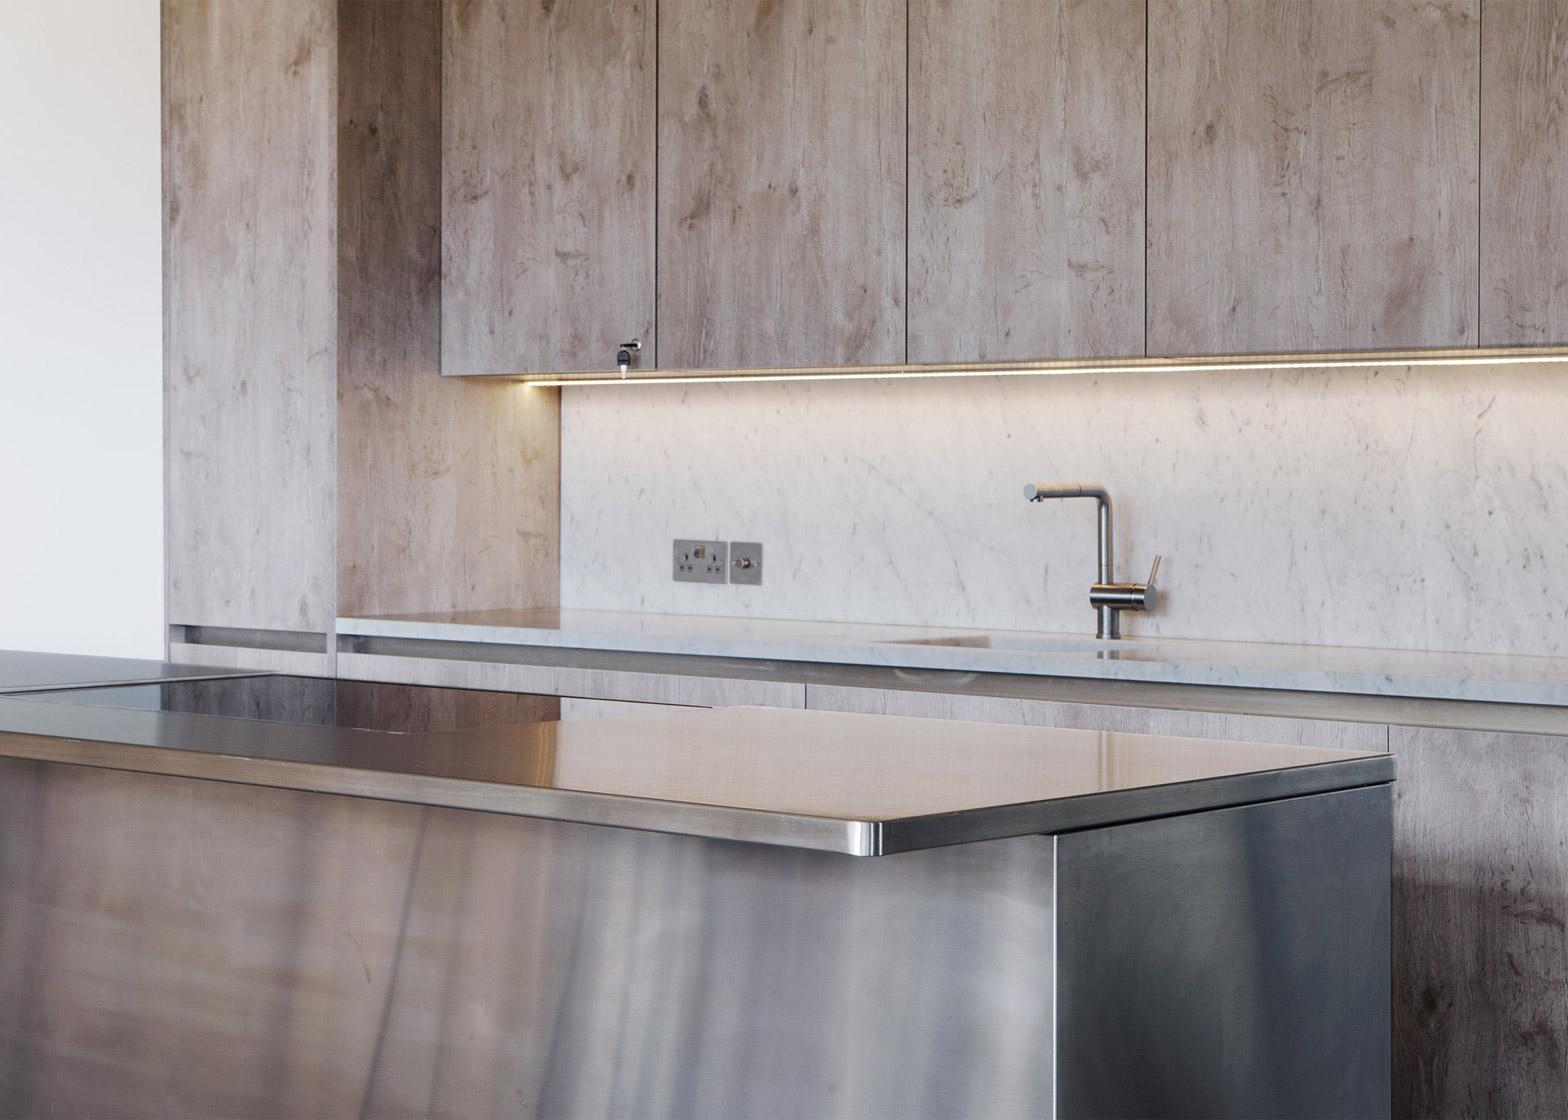 architecture_ambulance_house__design_studia_interiors_osnovadesign_osnova_poltava_03